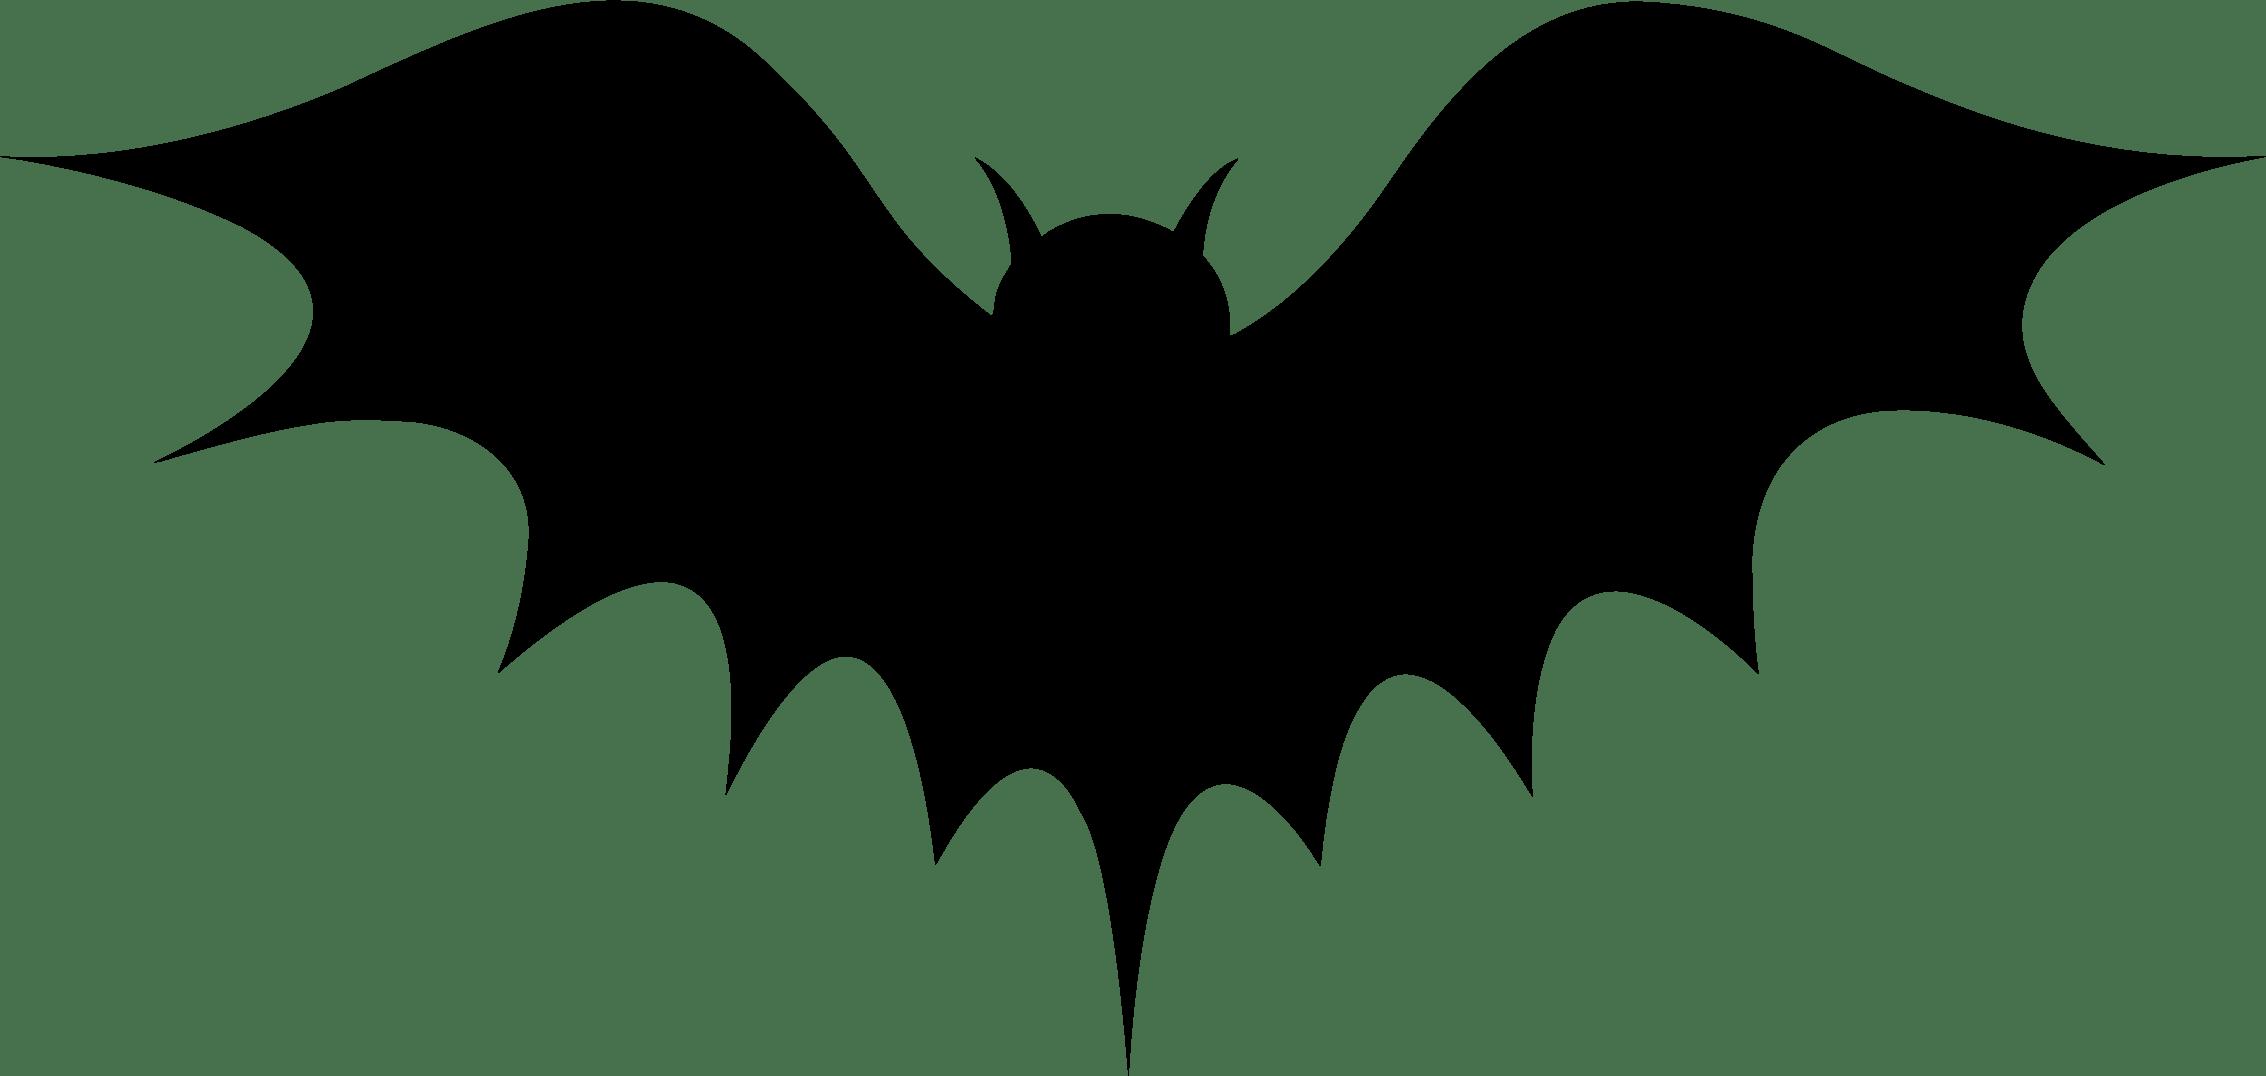 Clipart Bat Printable Clipart Bat Printable Transparent